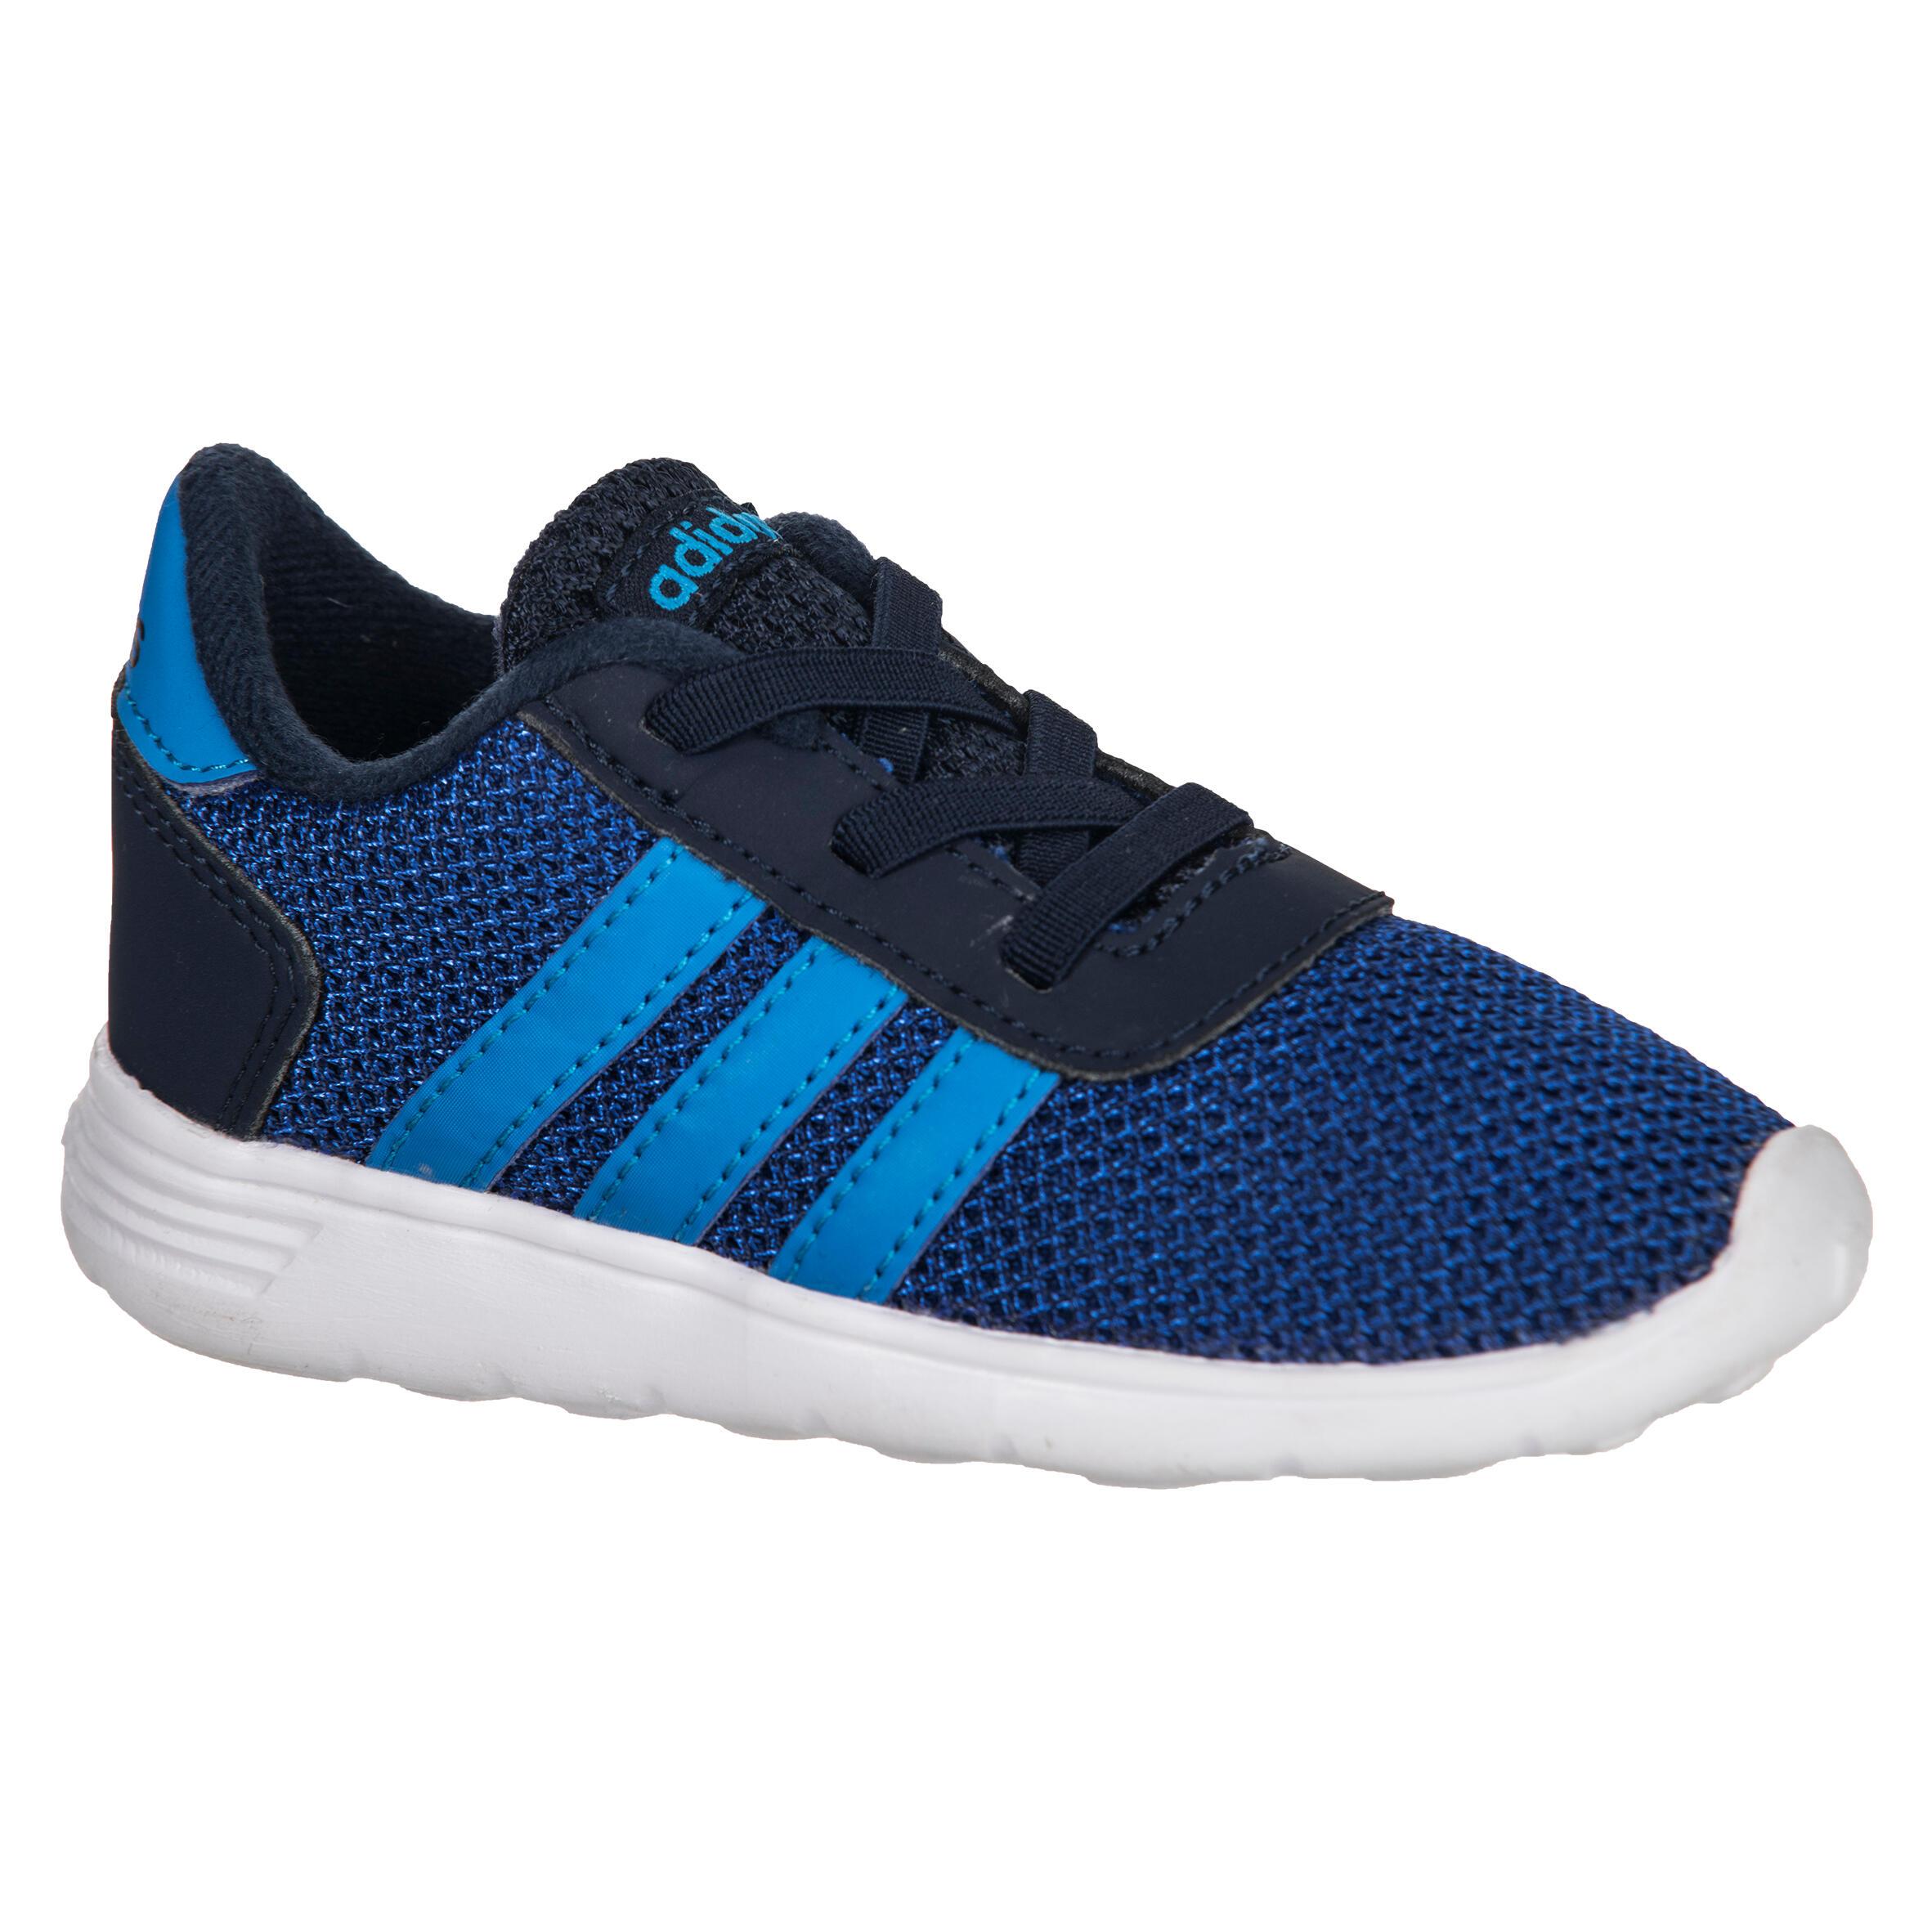 Decathlon Bébé Gym Garçon Bleues Chaussures Adidas nUFAWvq ... 3be3bcb71a0